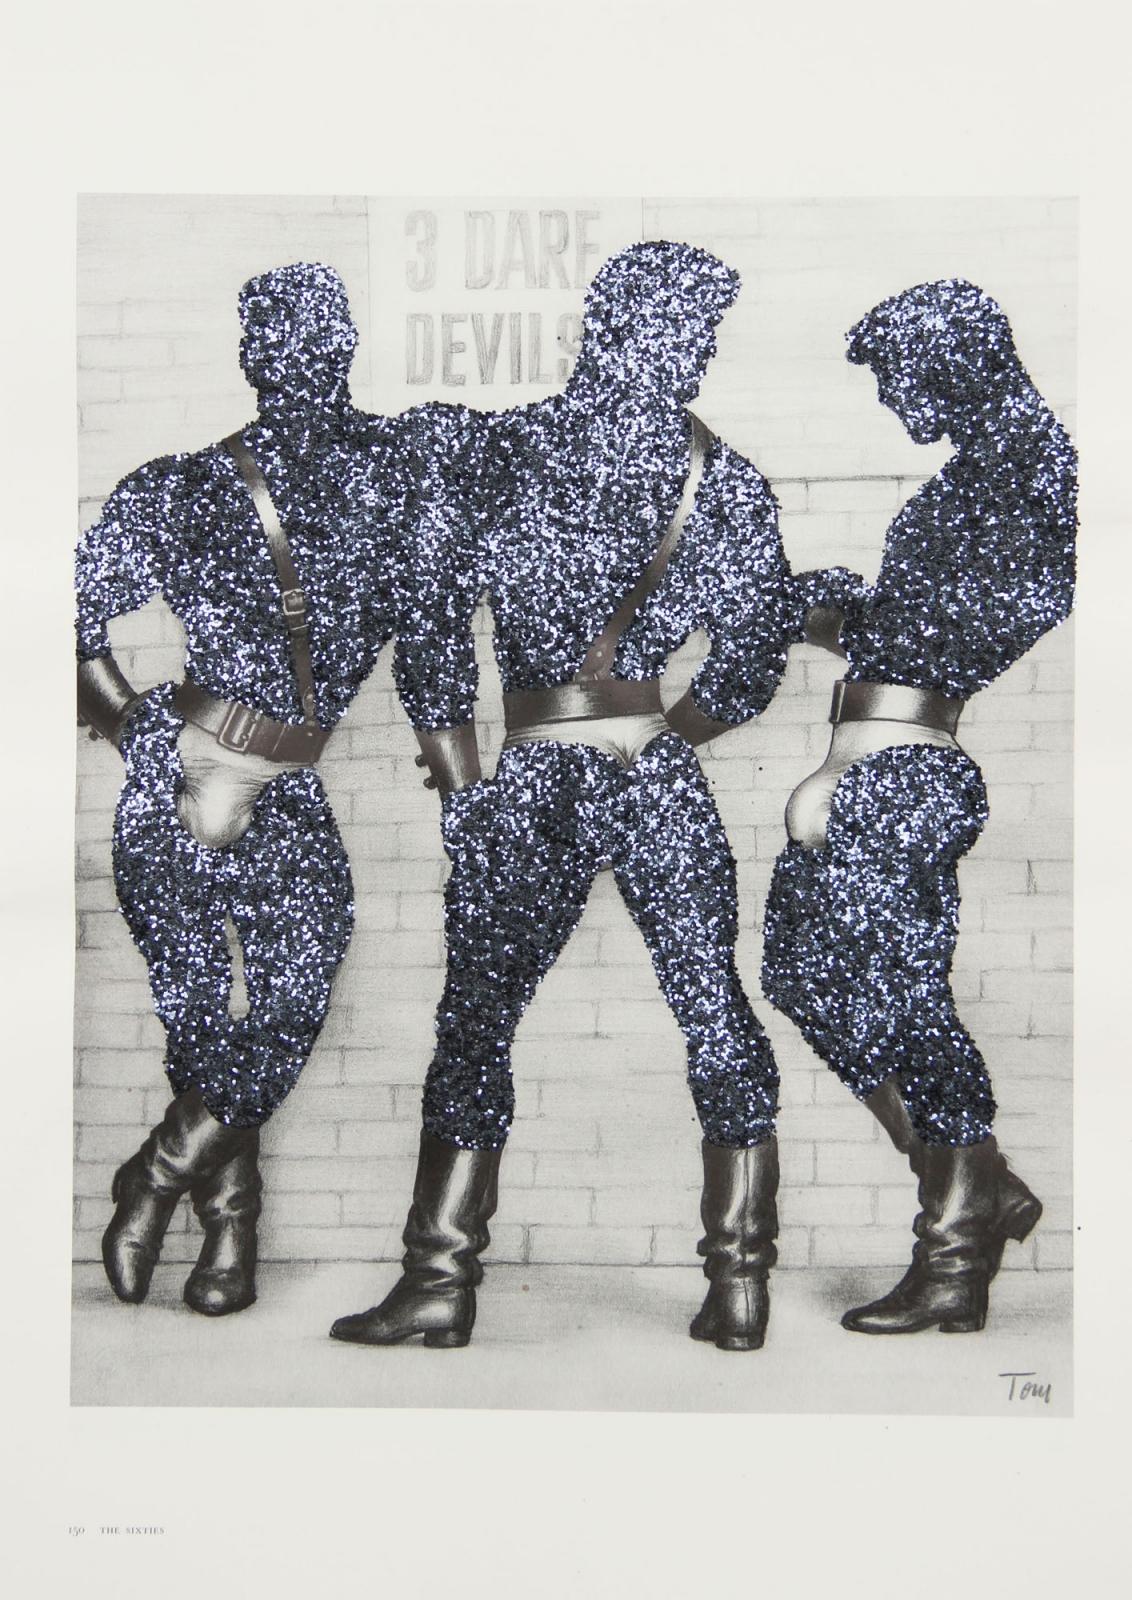 Body sculptures of Tomofinland